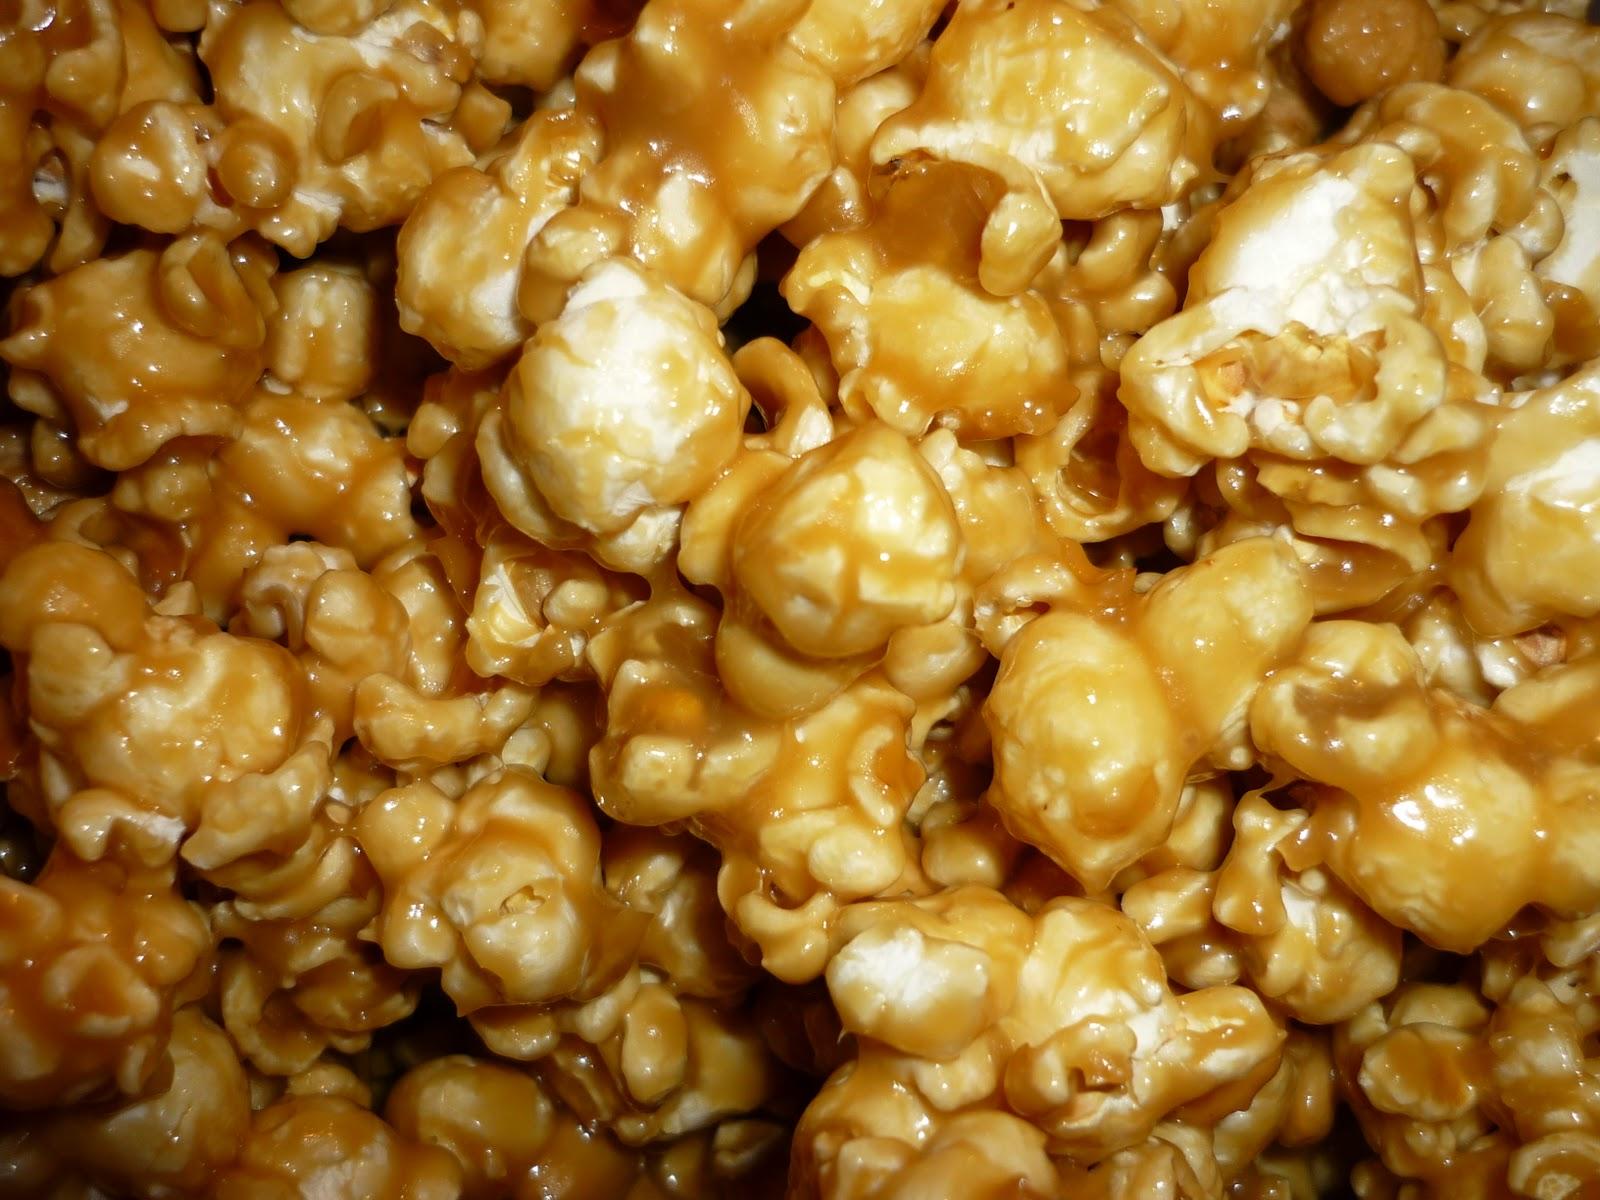 Snips & Spice: Gooey Caramel Popcorn